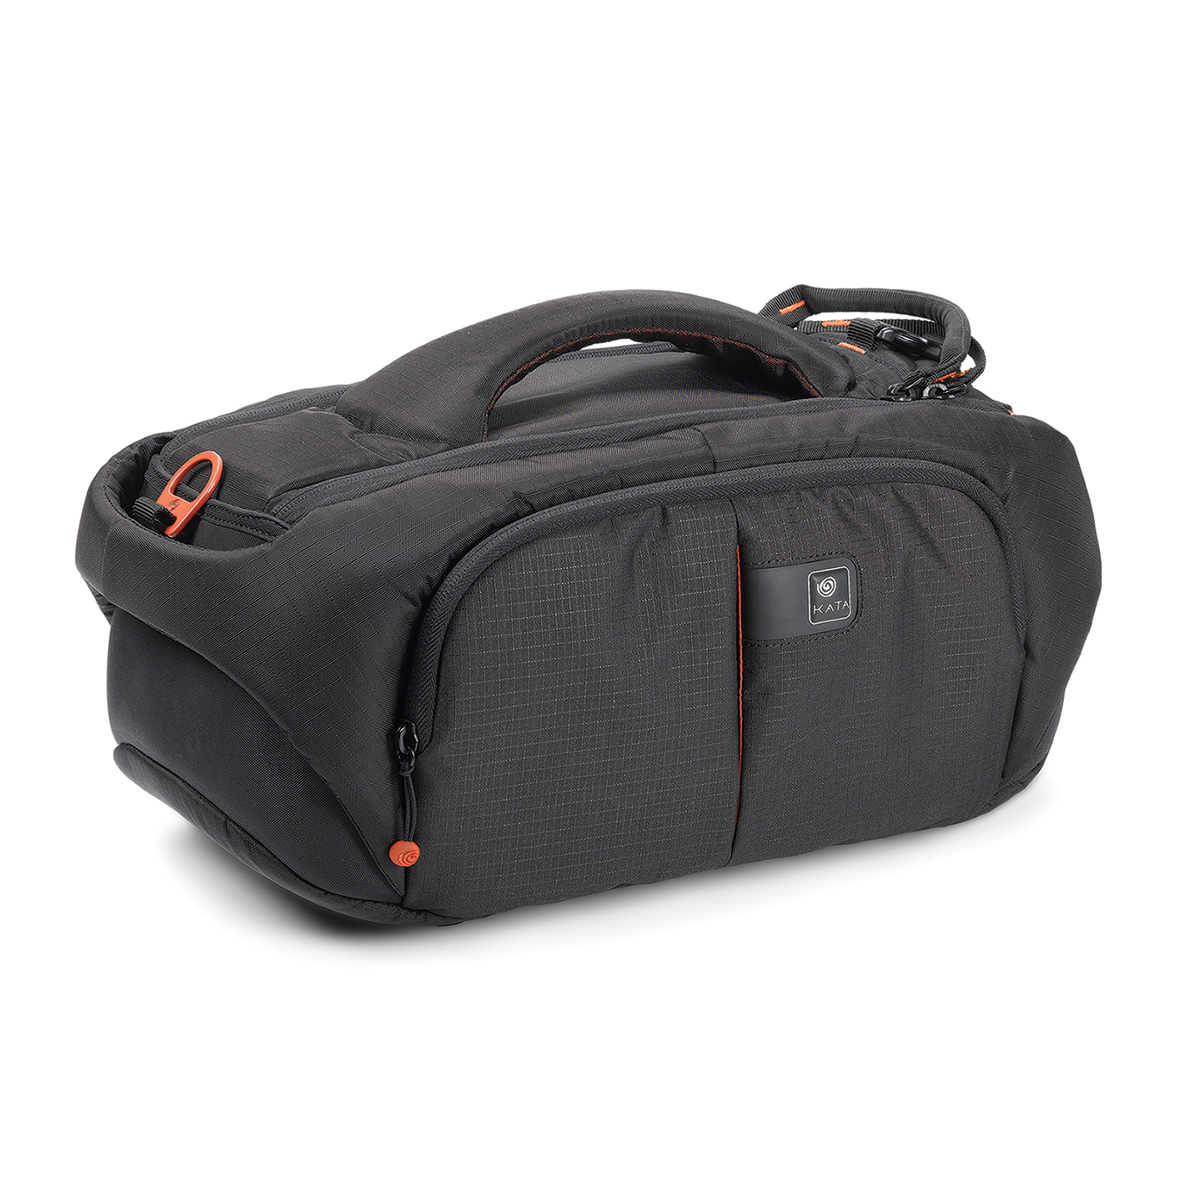 Photo Cases & Bags Kata Bags UK - CC-191 PL for Sony FS100, MC50 & similar